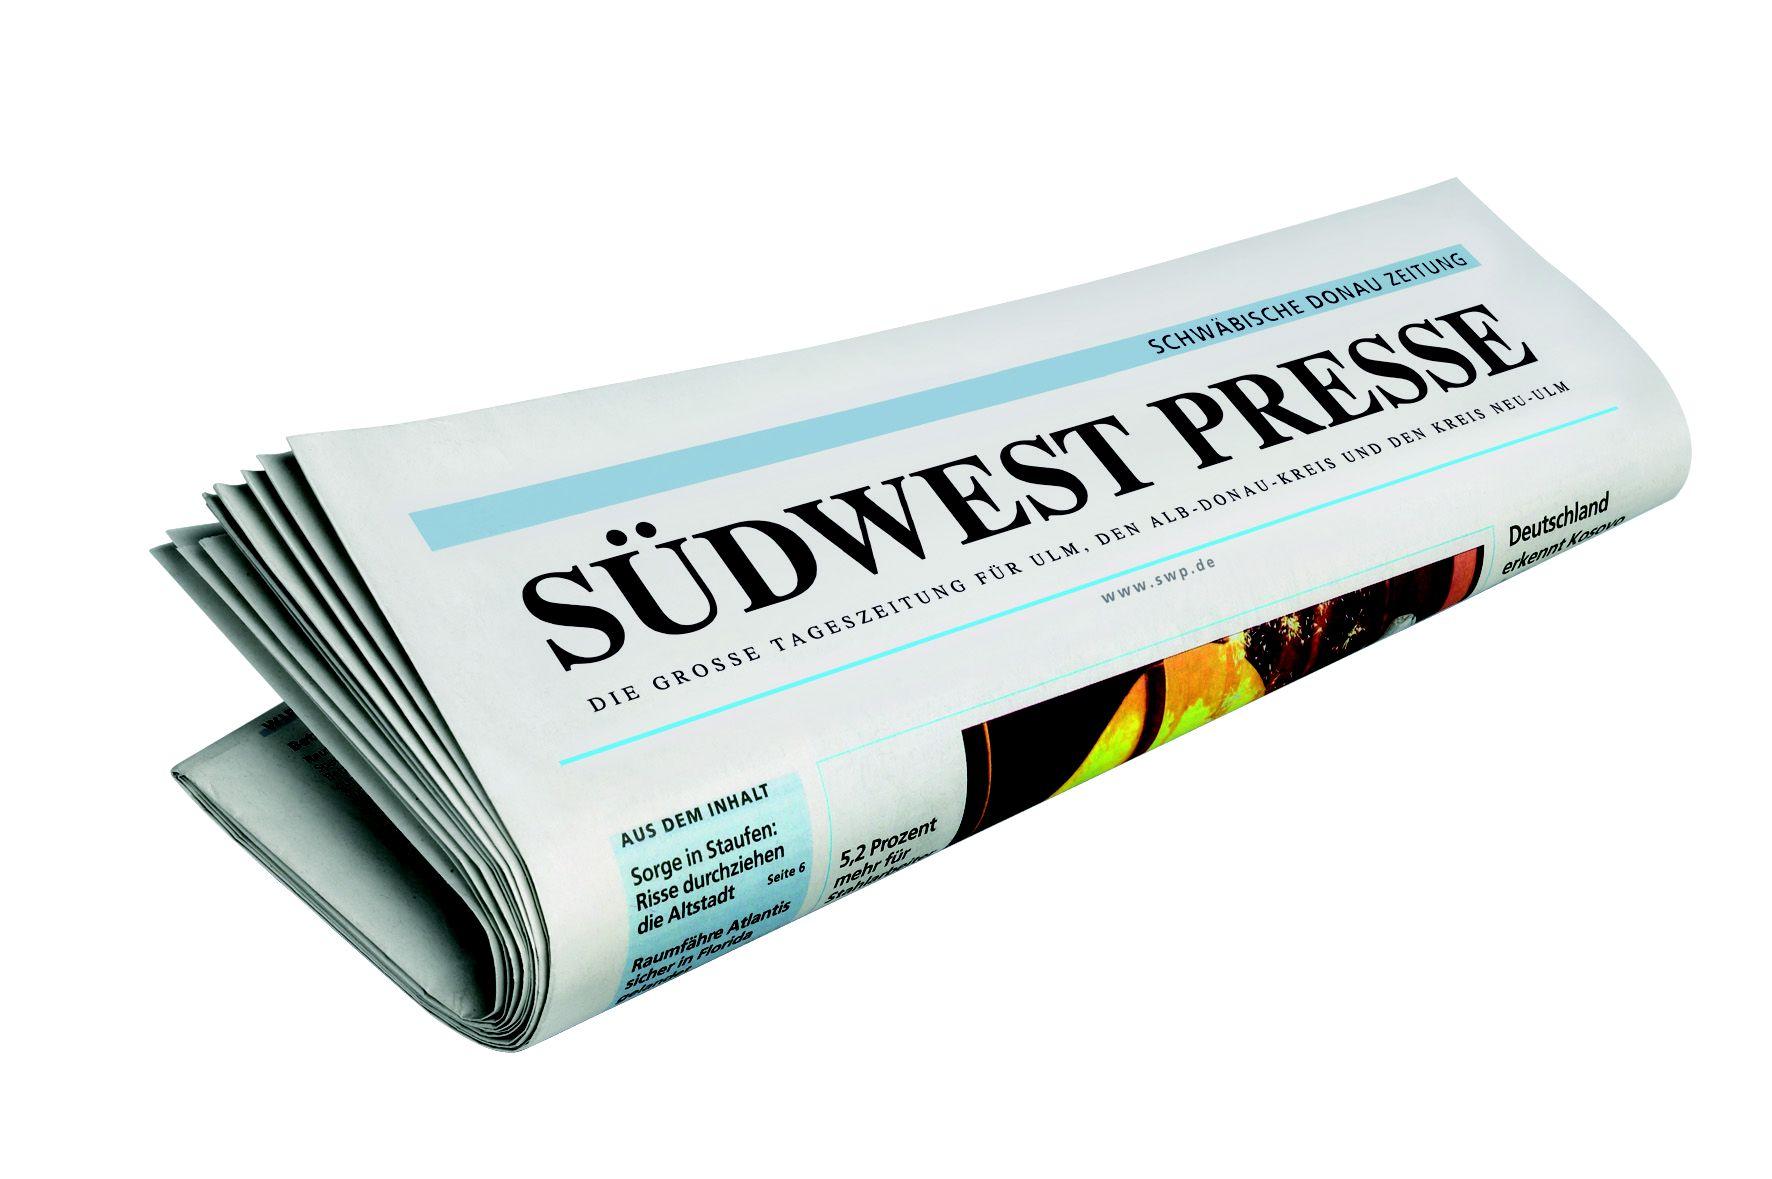 Sudwestpresse